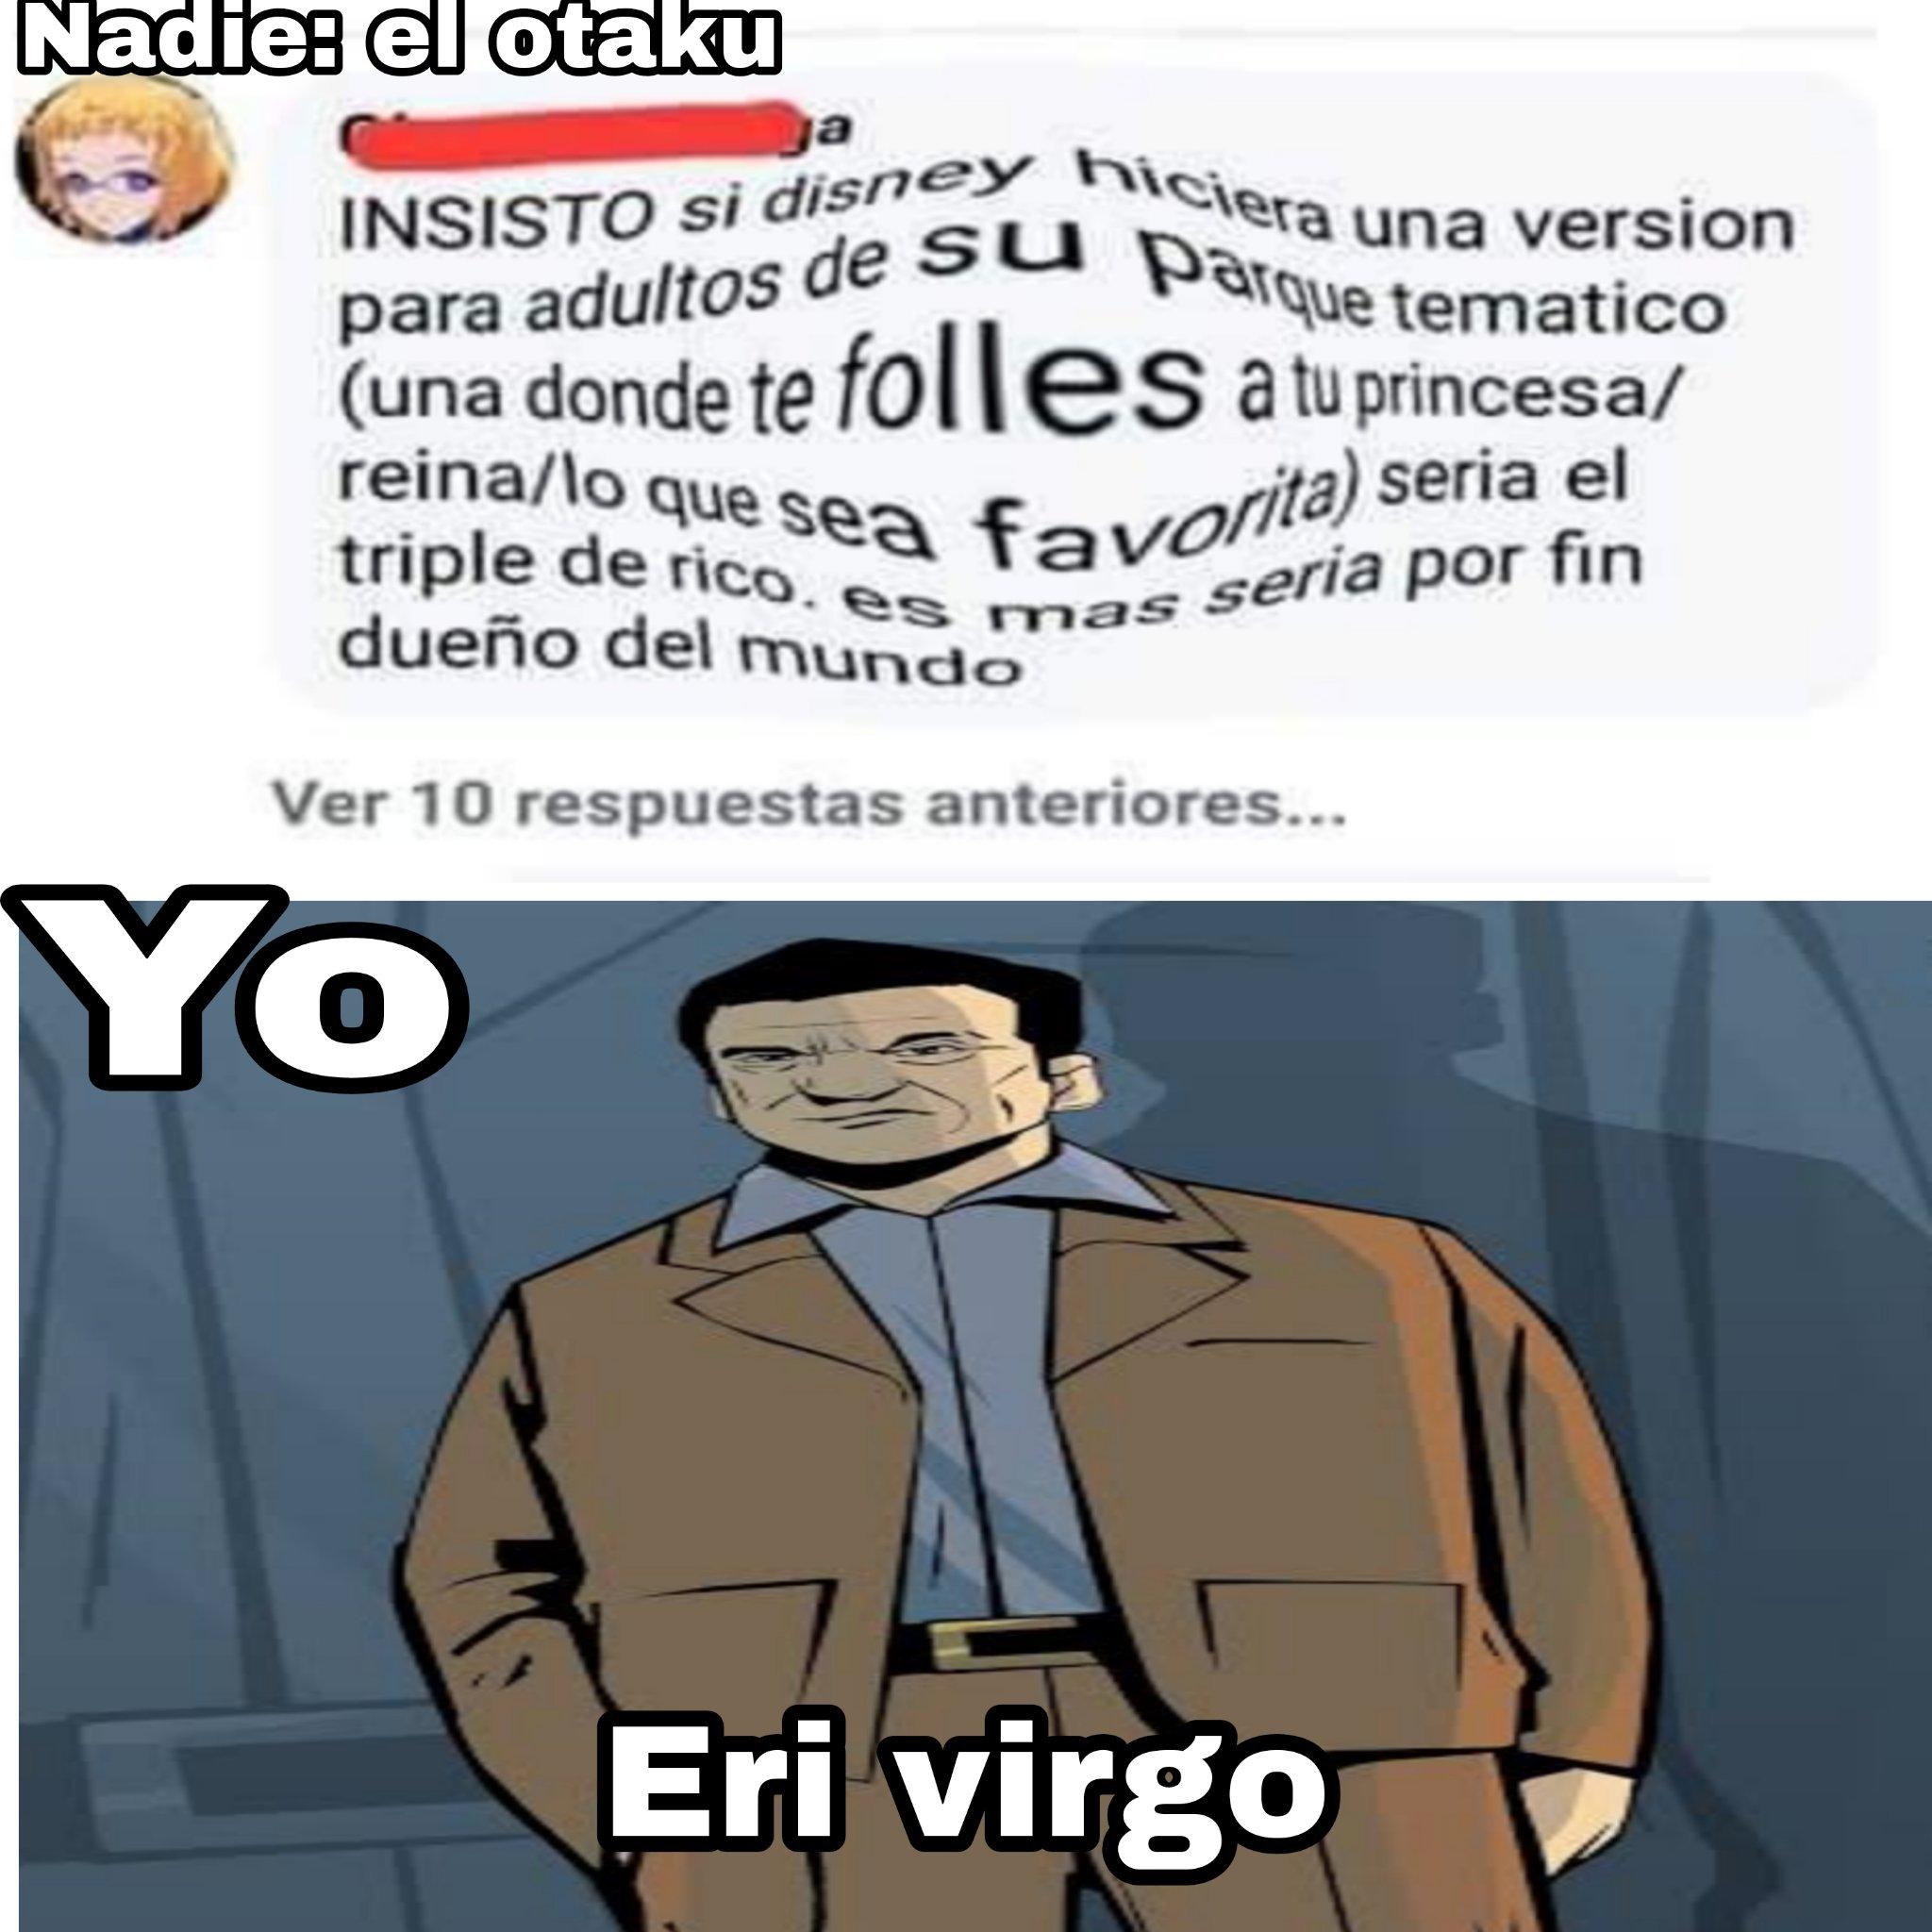 Facebook nido de otakus - meme